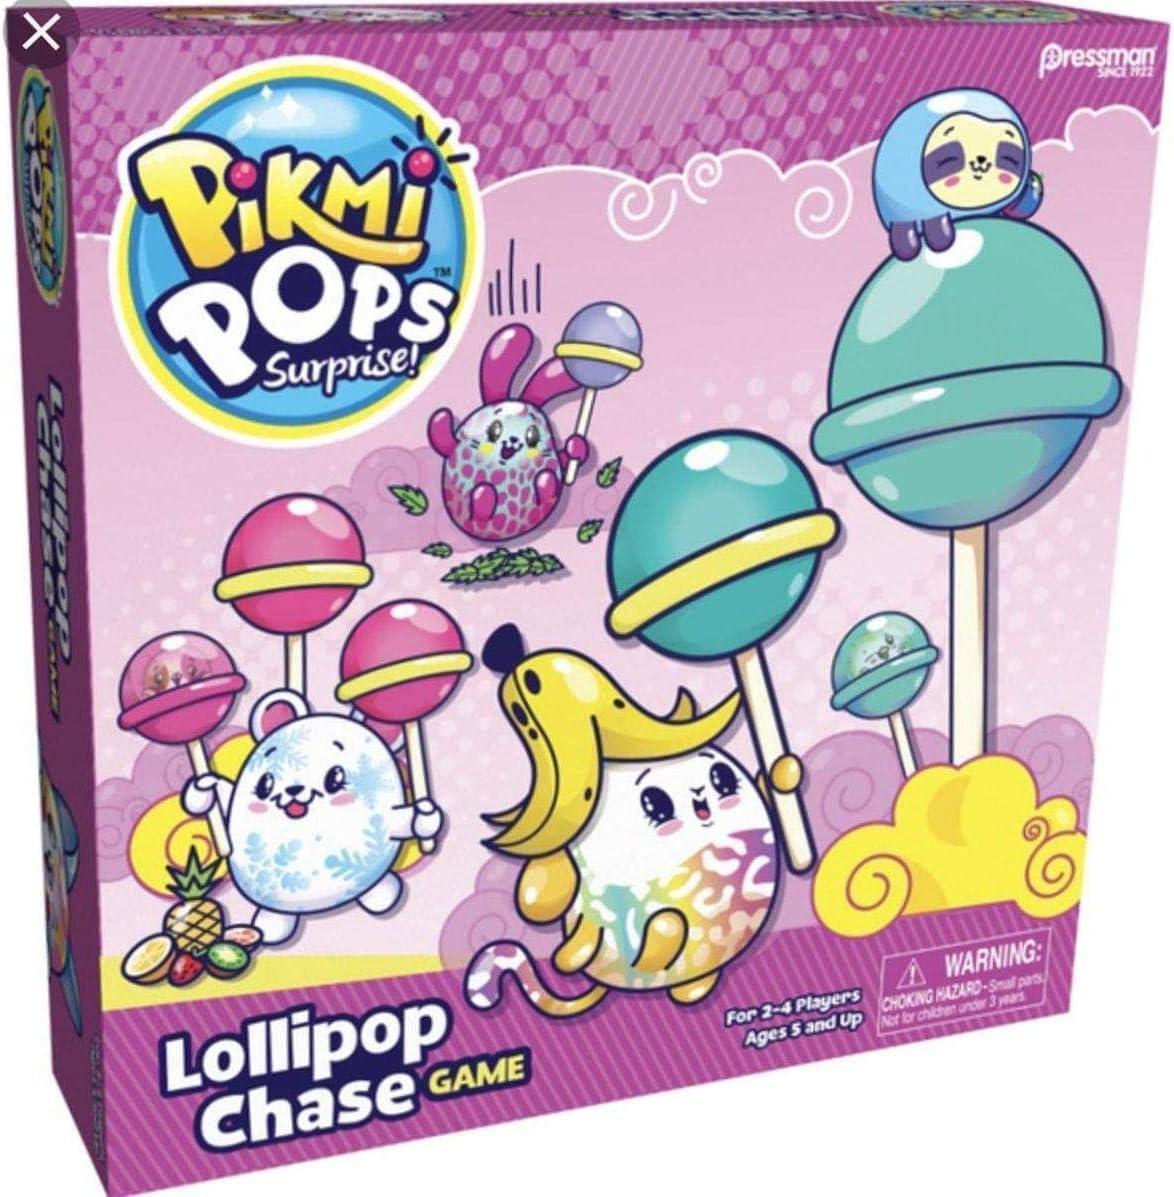 Lollipop Chase Game Pressman Five Below Pikmi Pops Surprise